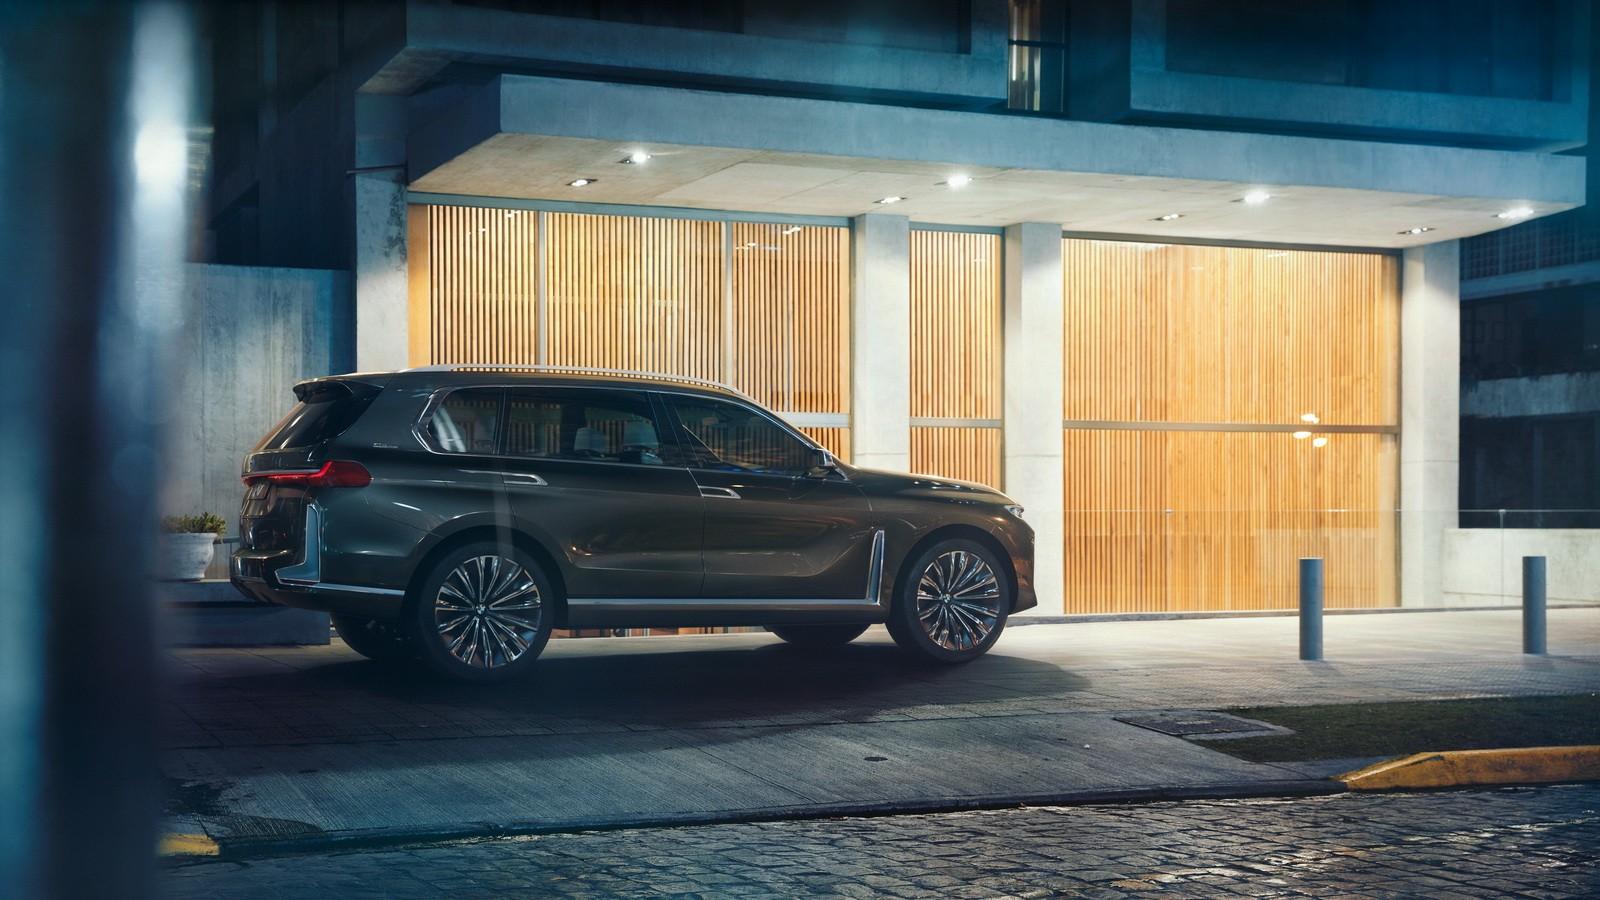 2019 Bmw X7 Sav Edges Closer To Production Concept Looks Opulent Autoevolution